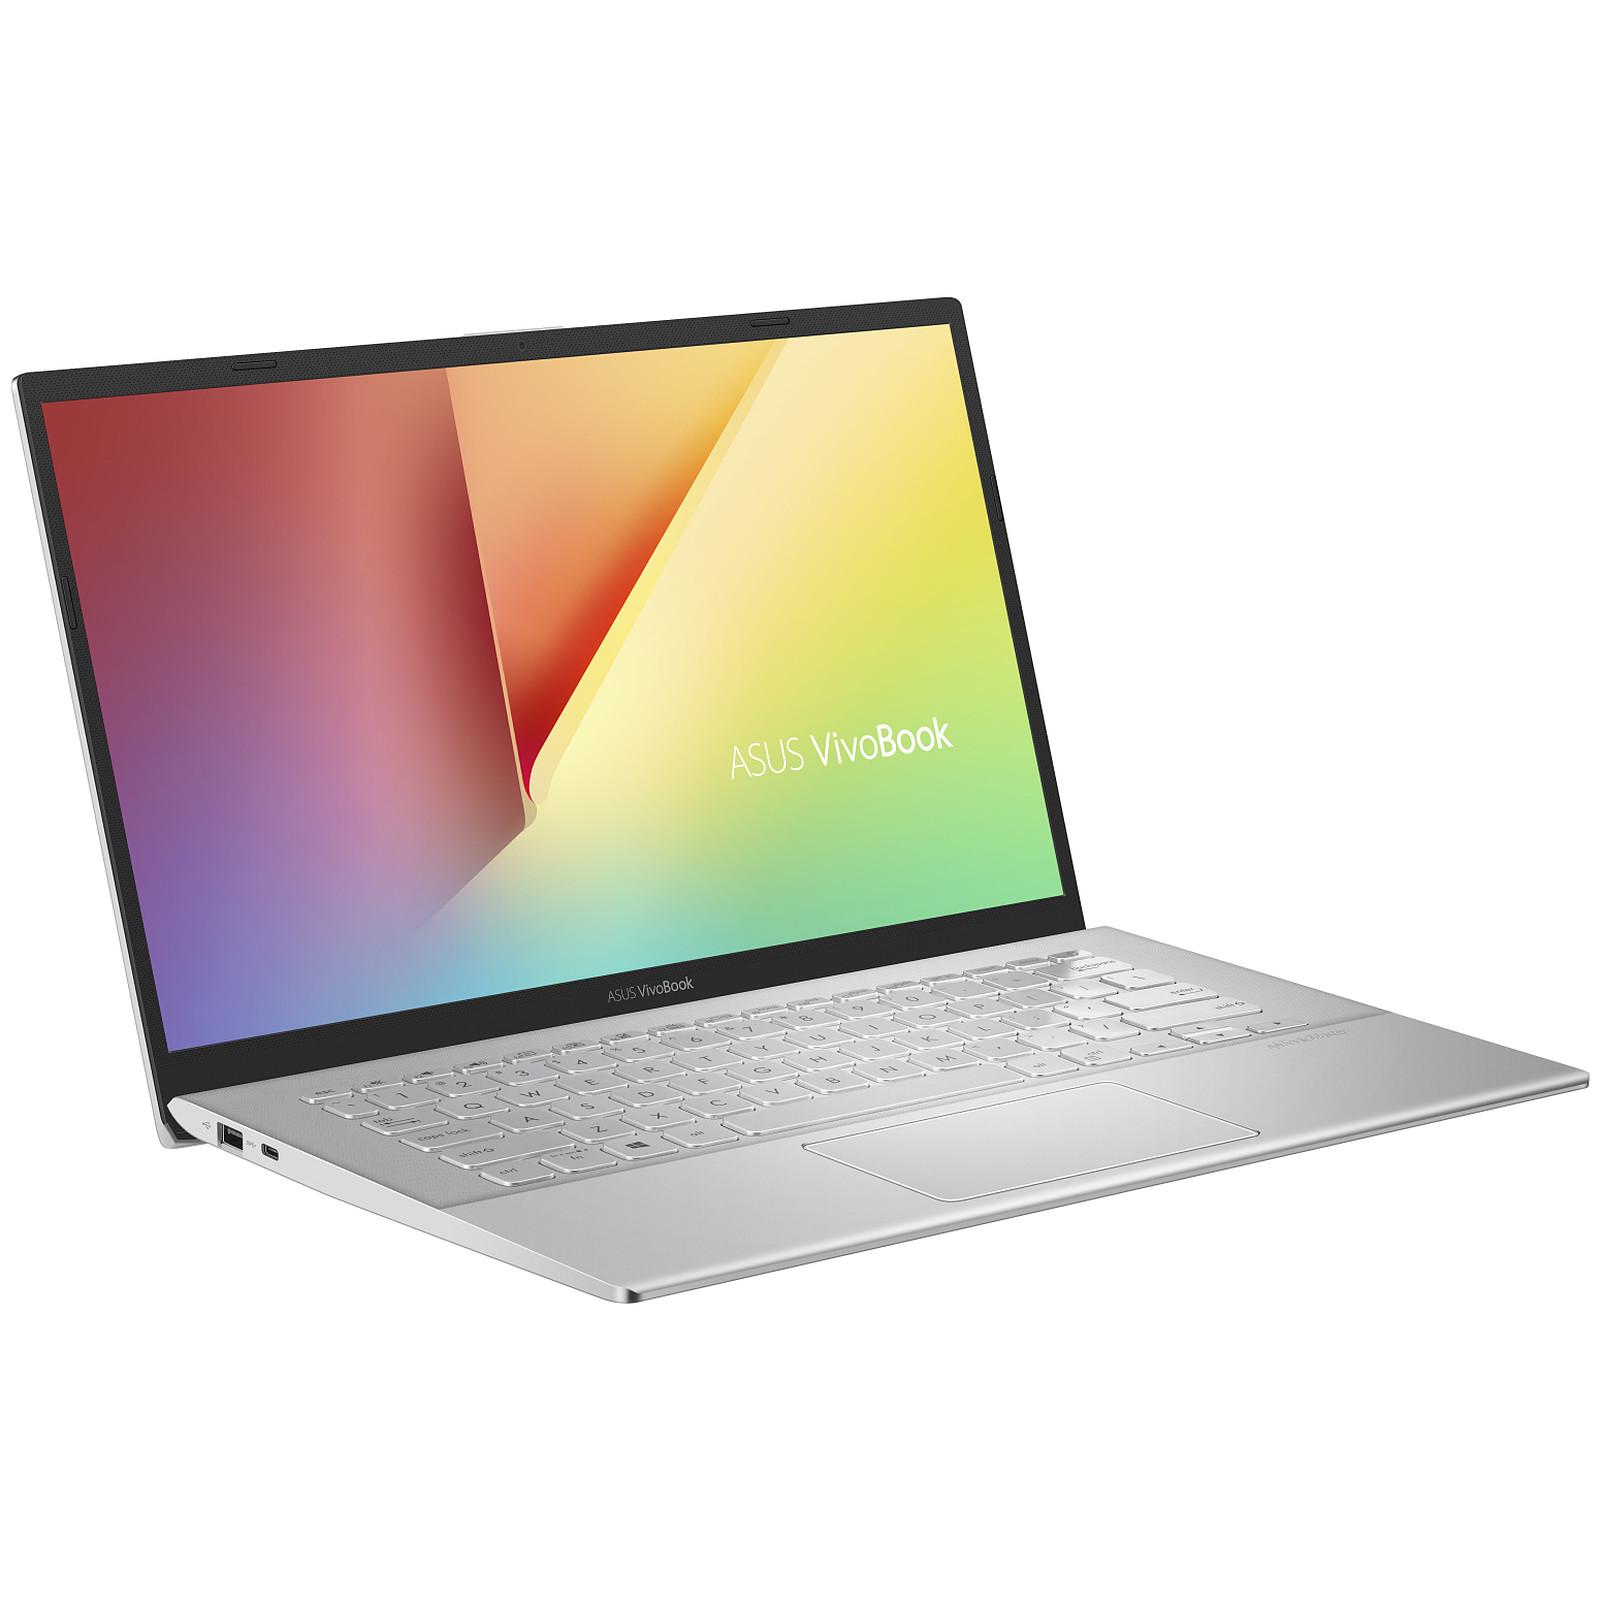 ASUS Vivobook R420UA-EK150T